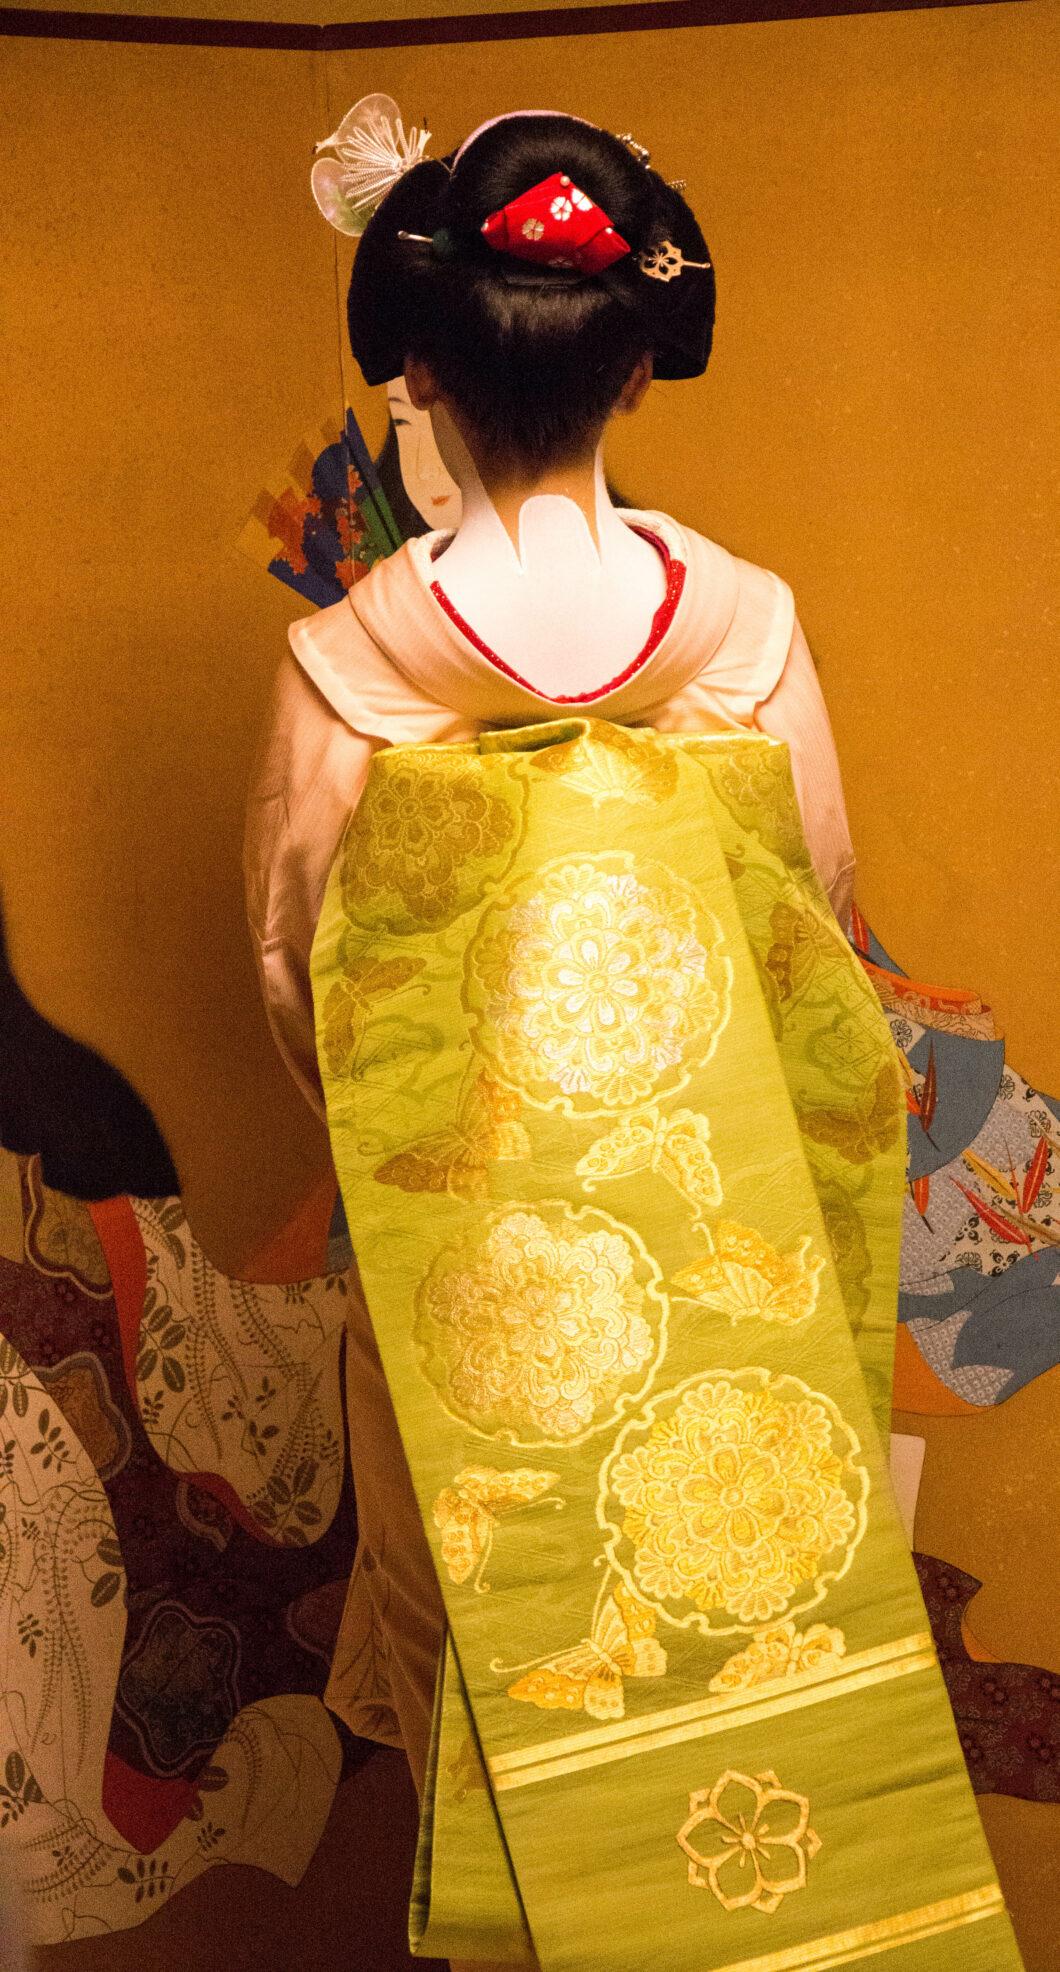 A Maiko's obi